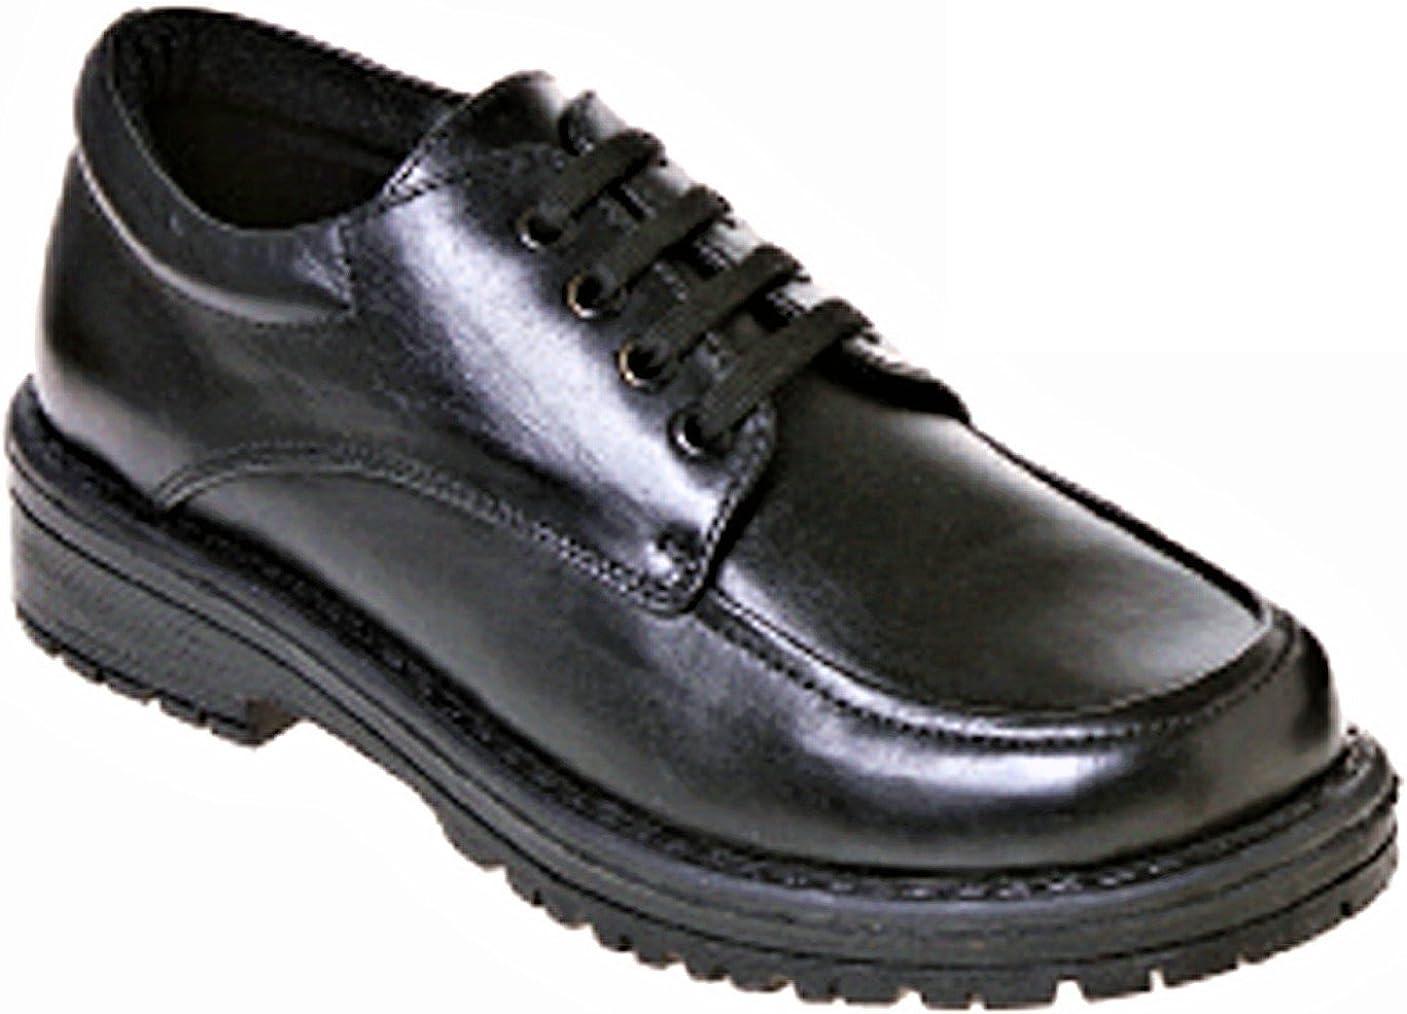 Boys Black Leather Shoes Non Marking Sole EU